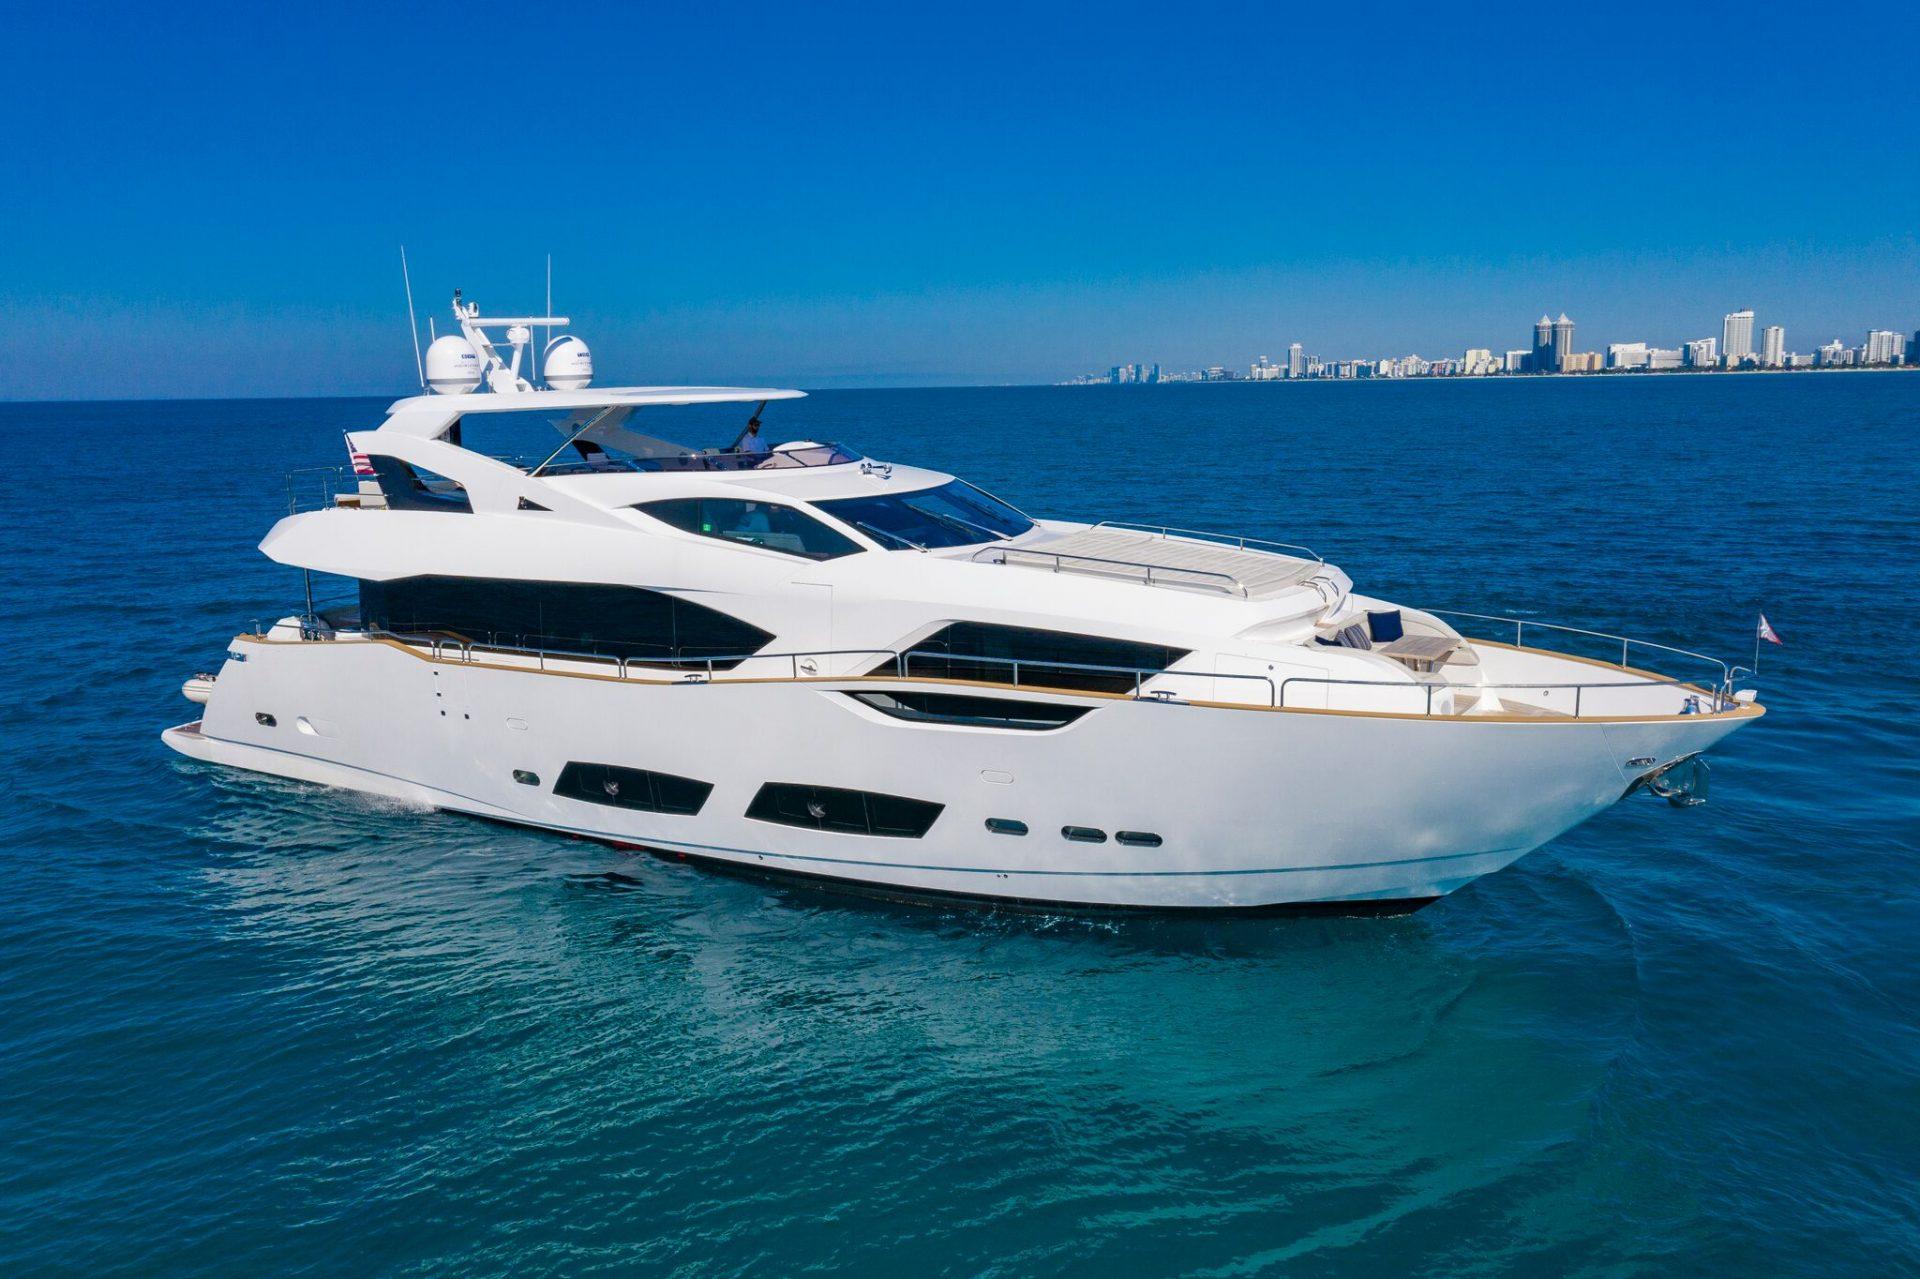 PERSISTENCE yacht Charter Brochure